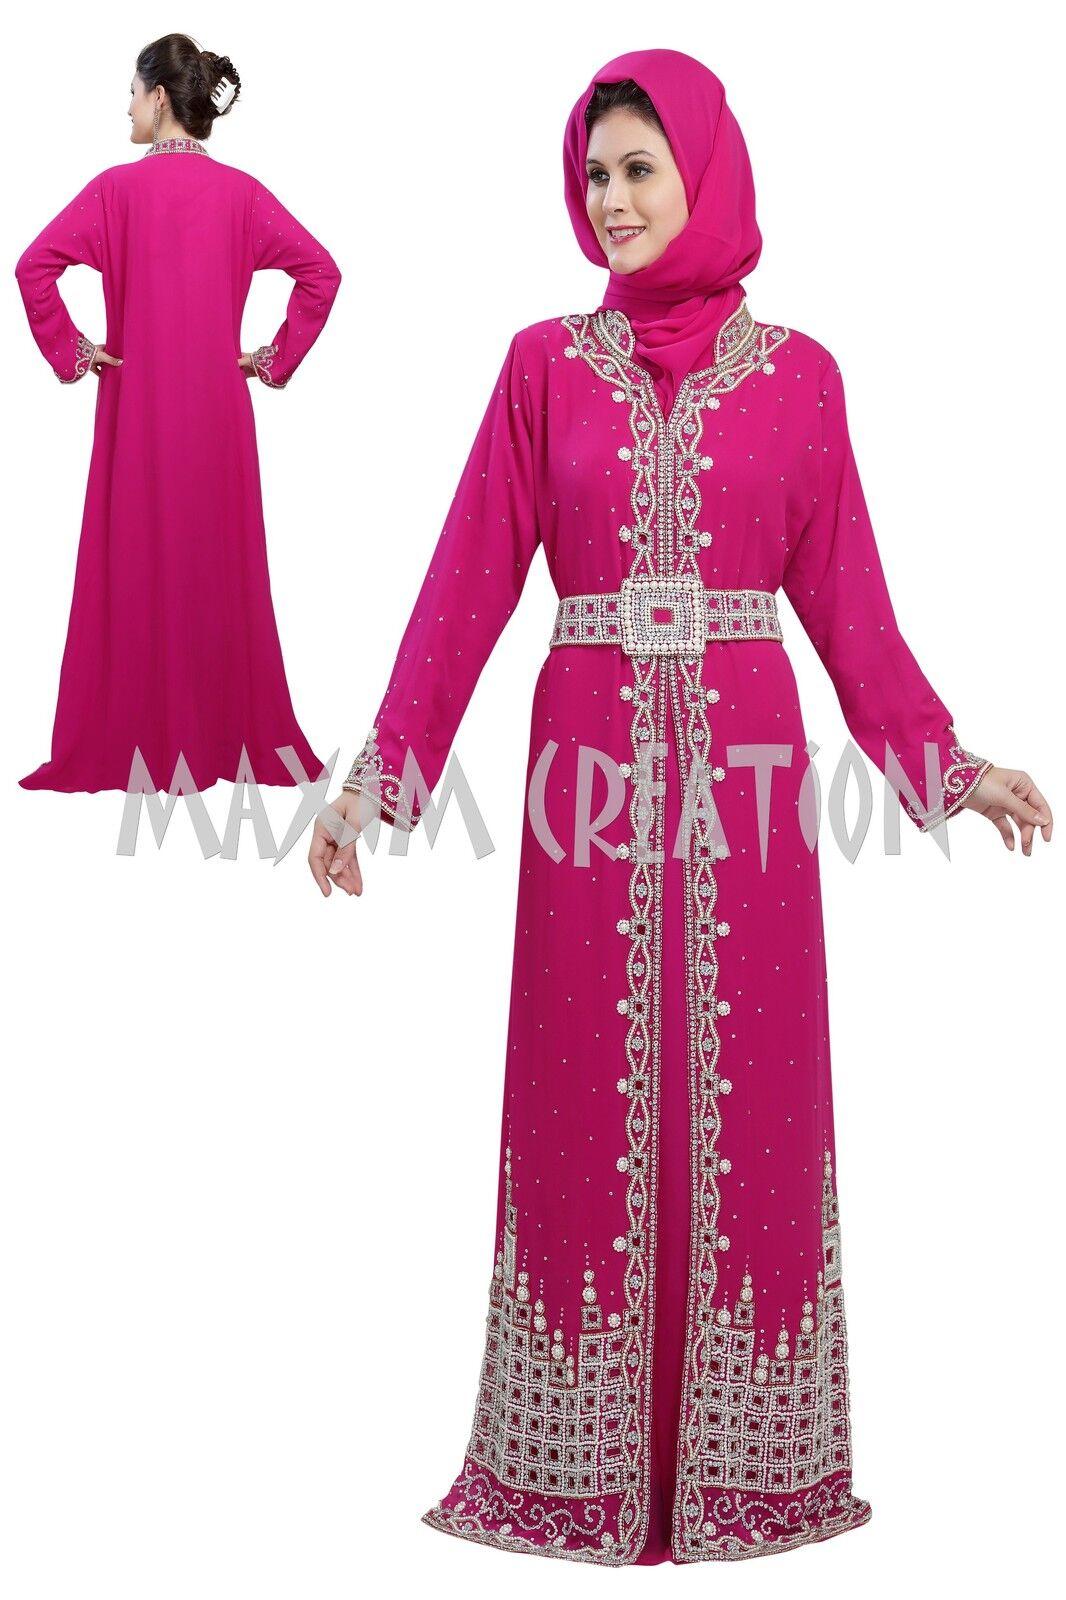 ELEGANT FANCY THOIBE CUT WORK HAND EMBROIDERY ISLAMIC TAKSHITA DRESS 5171